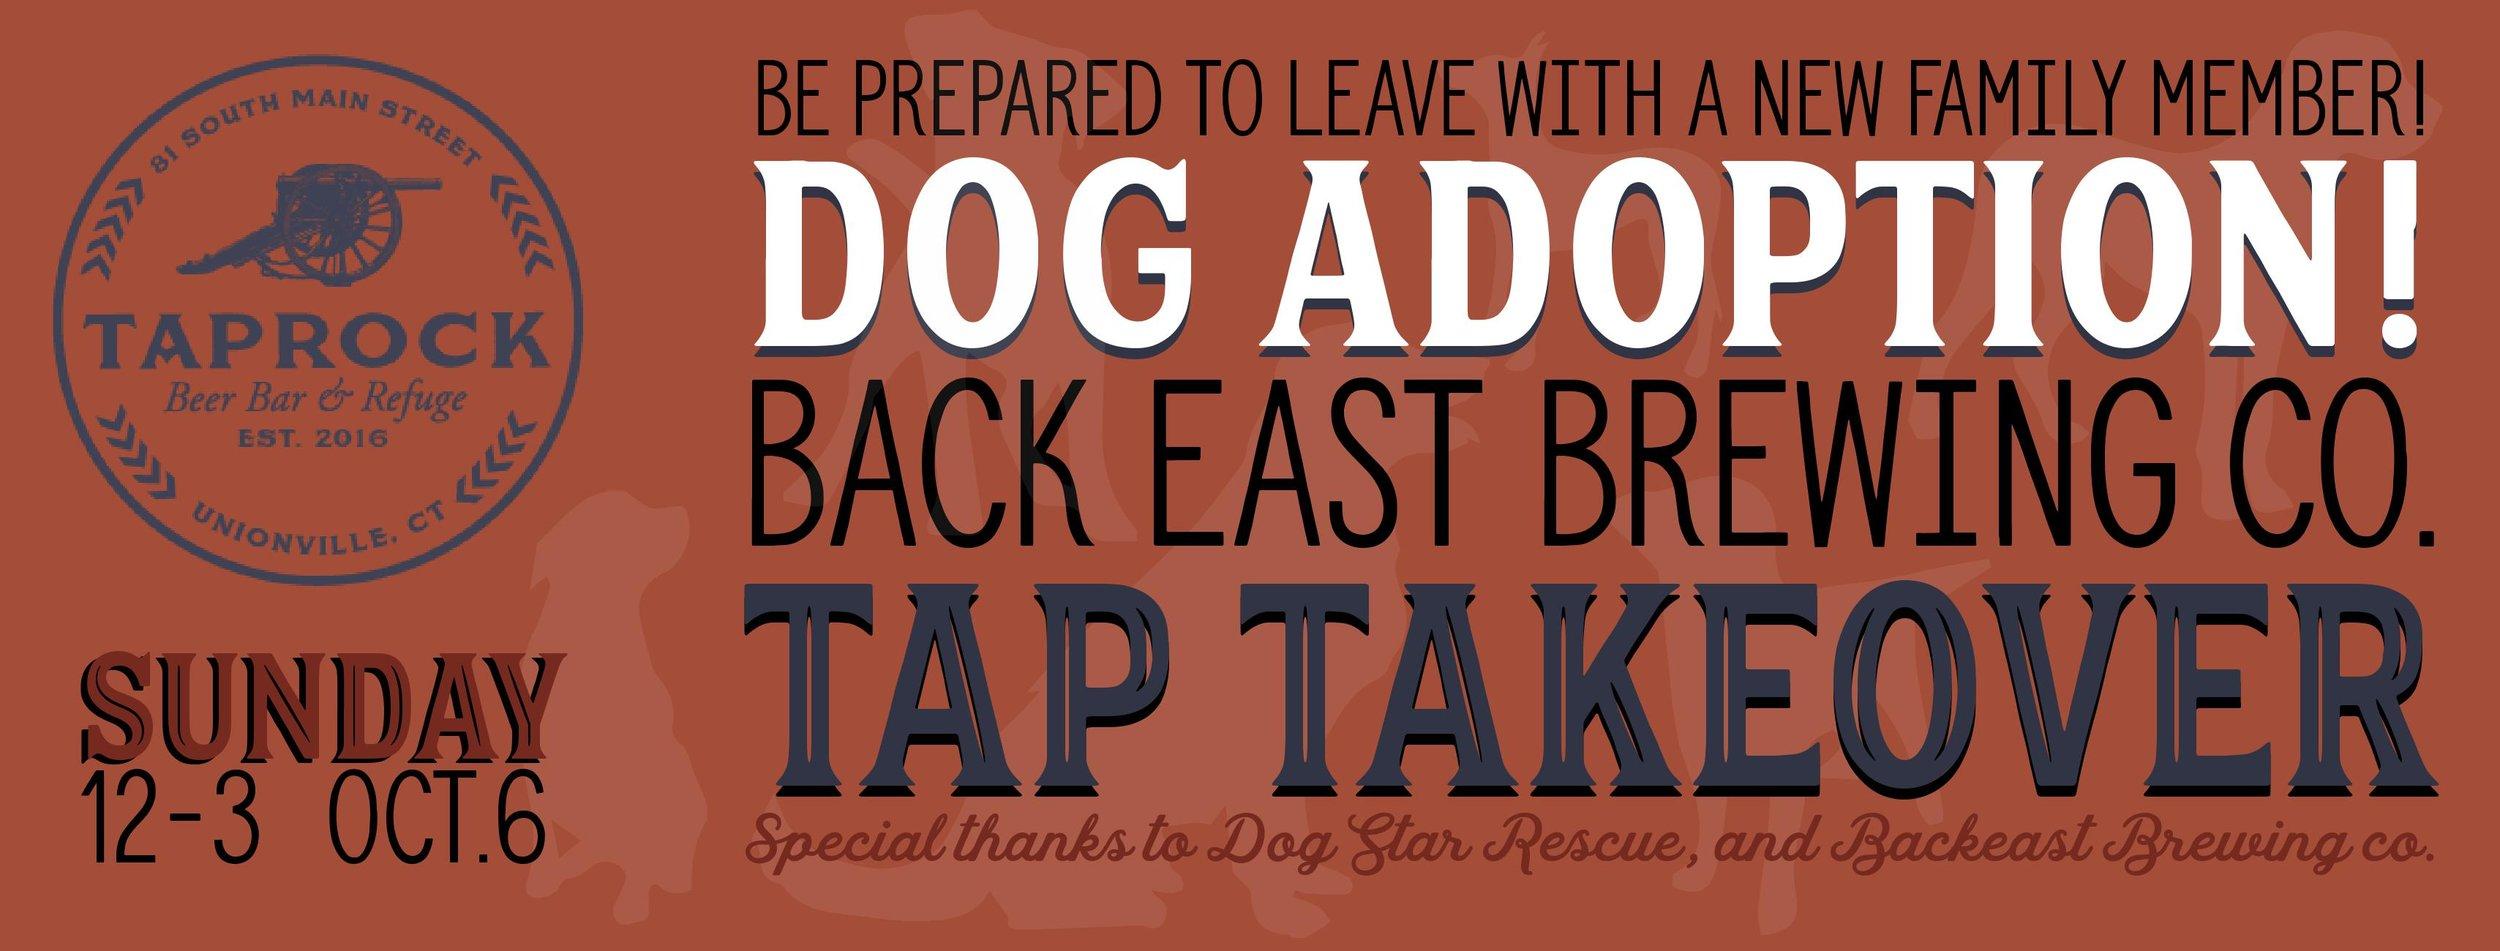 dog adoption banner.jpg